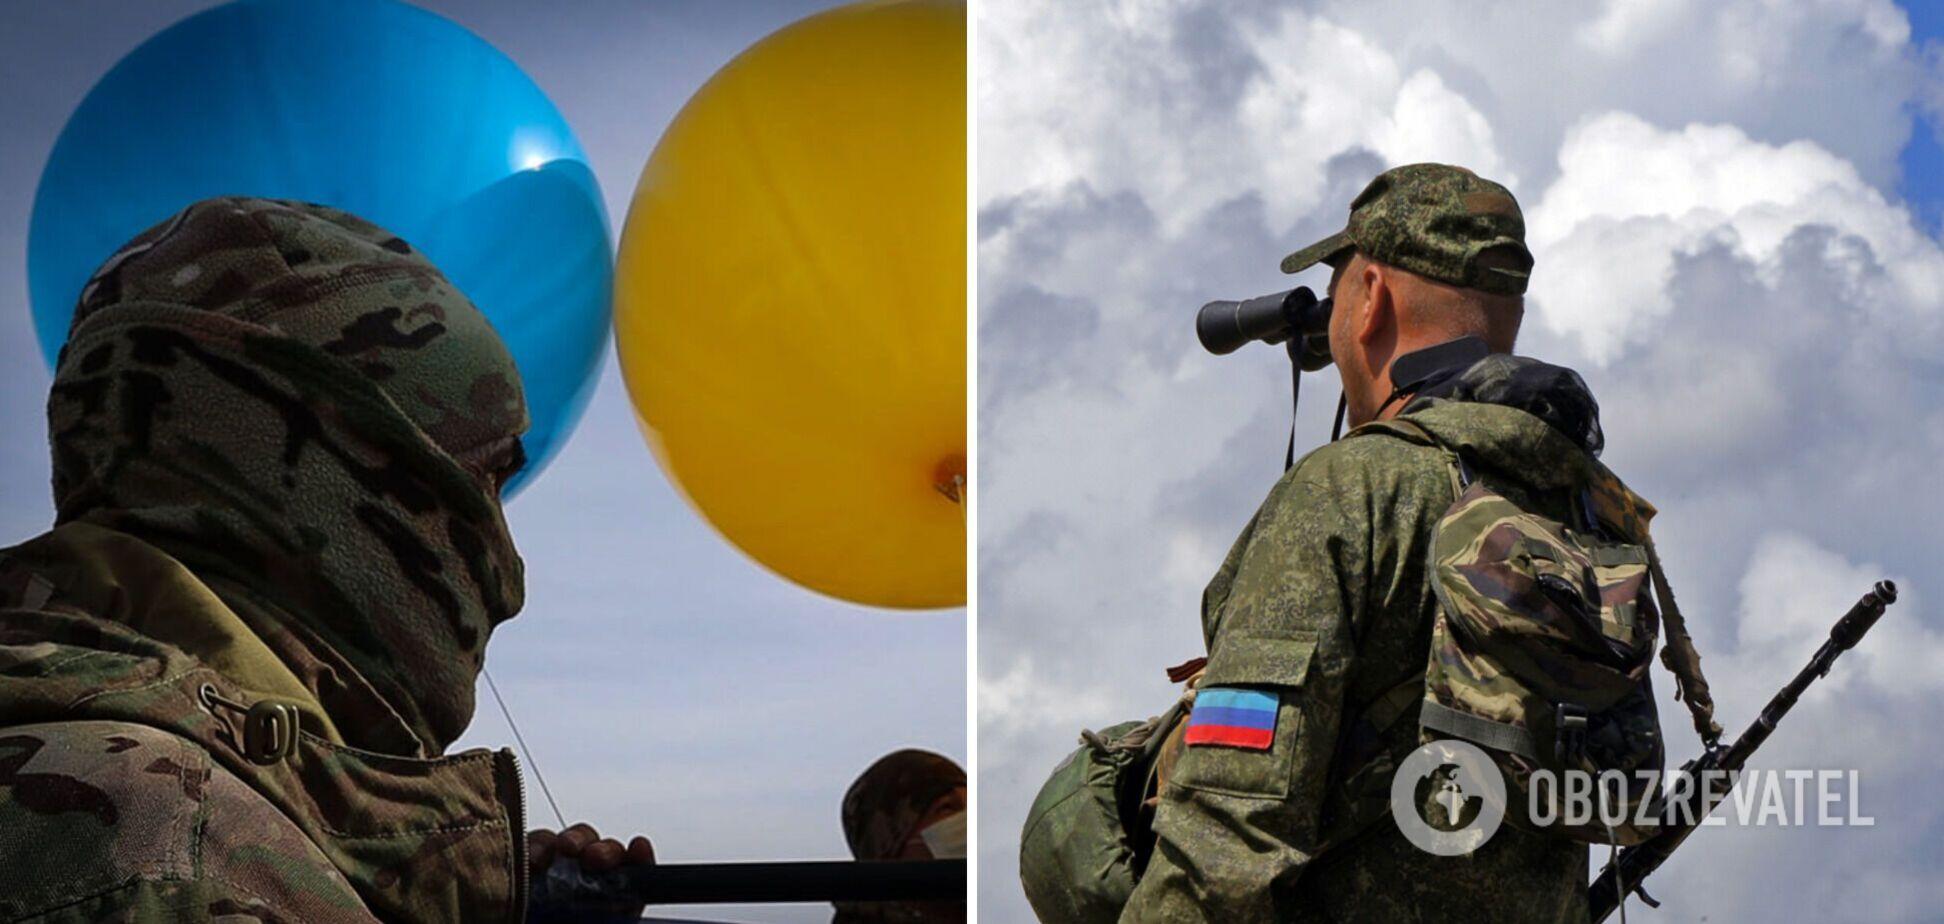 На Донбассе передали привет оккупантам от Нацгвардии